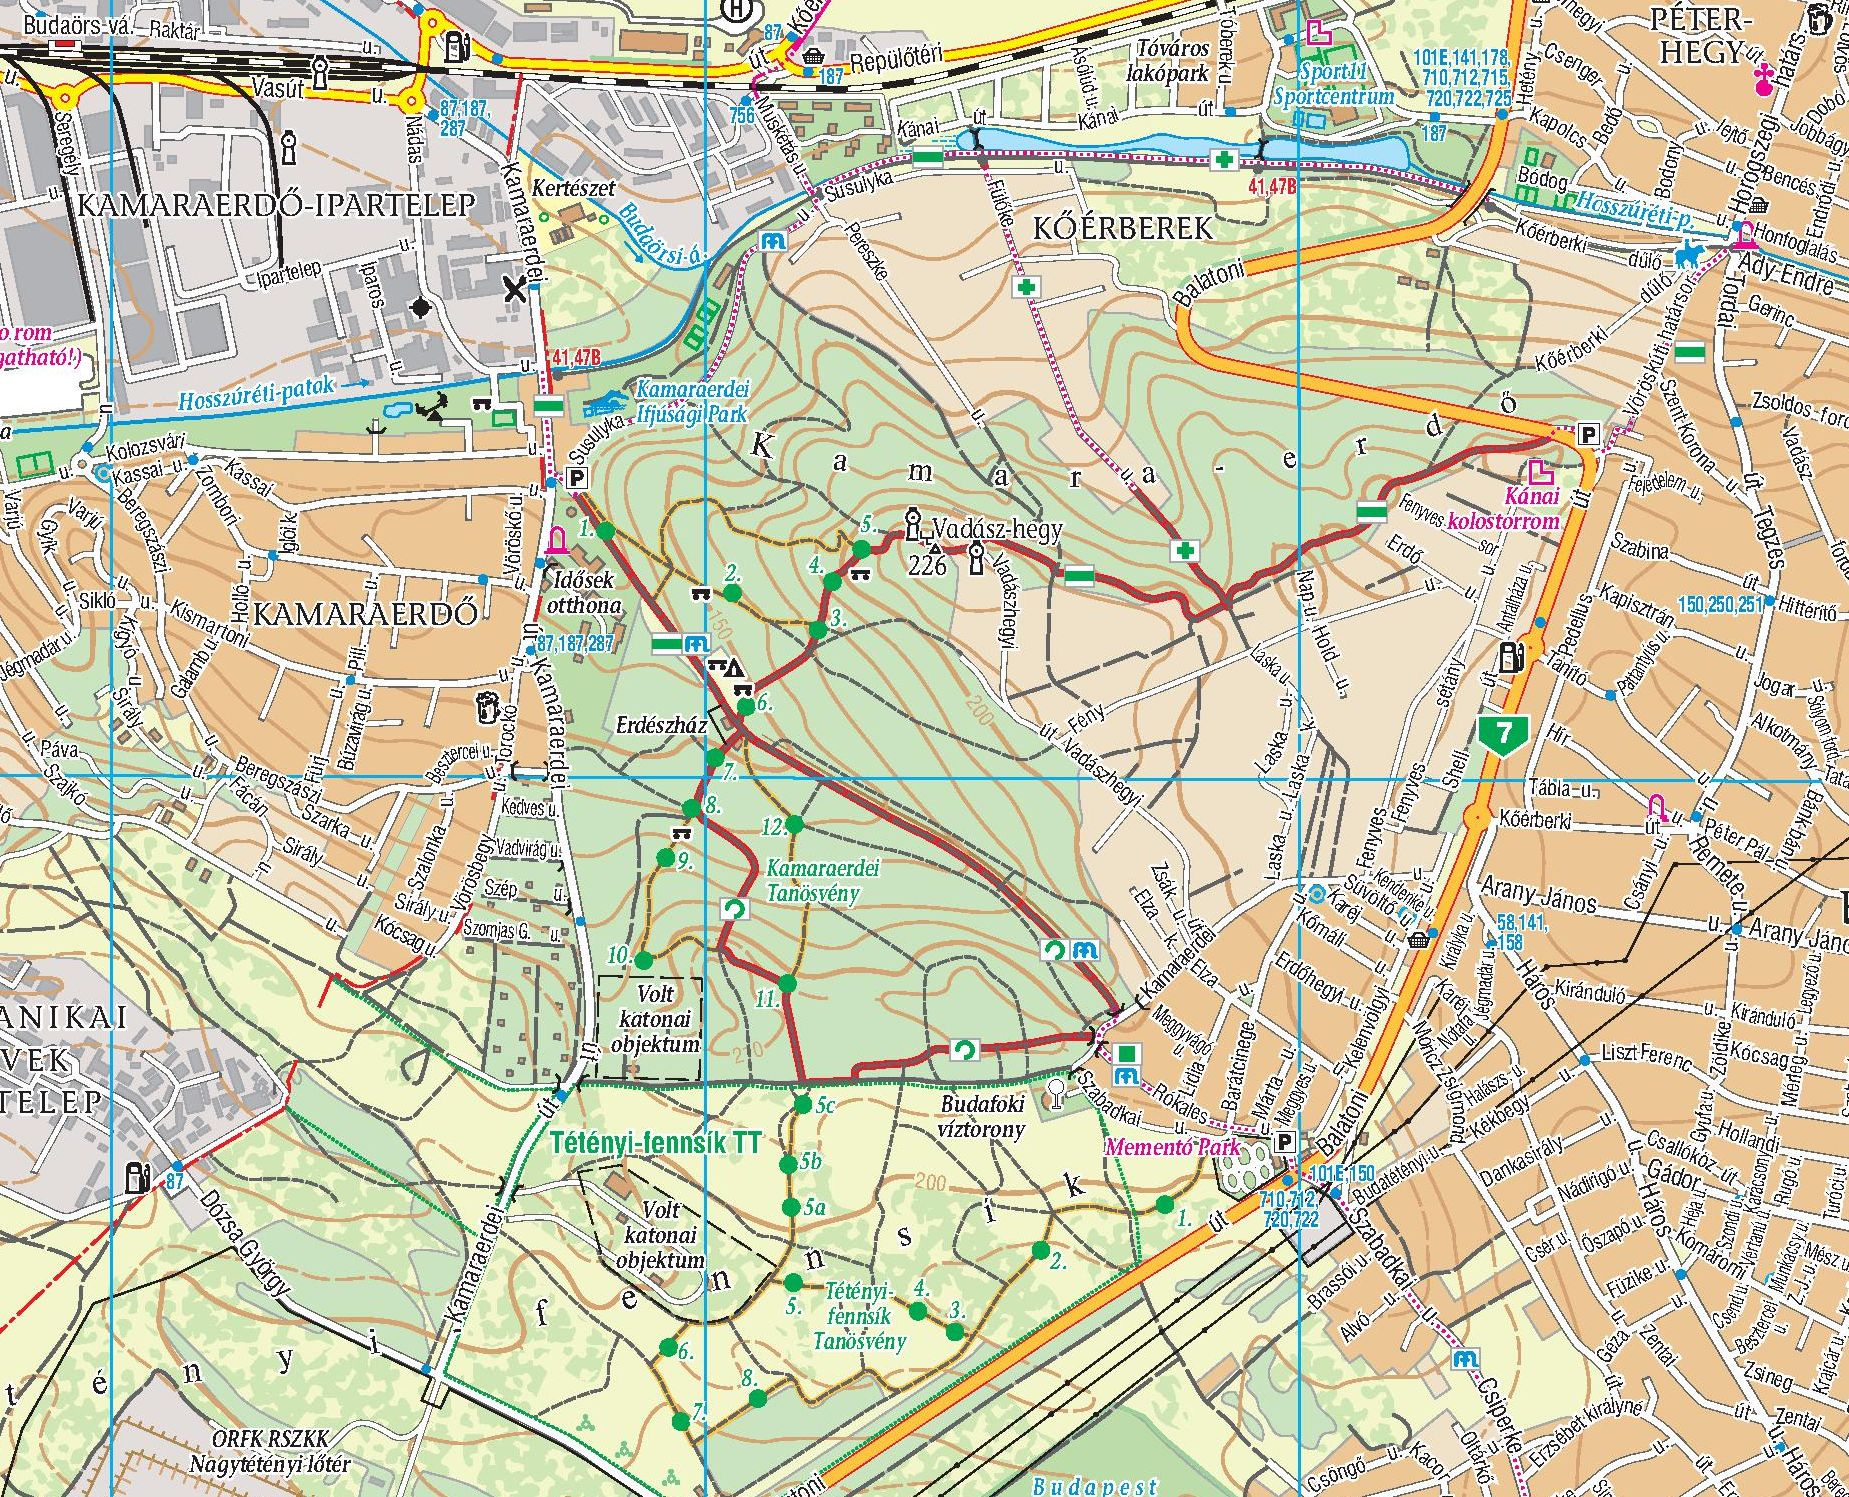 Buda hills 1:25.000 sample map